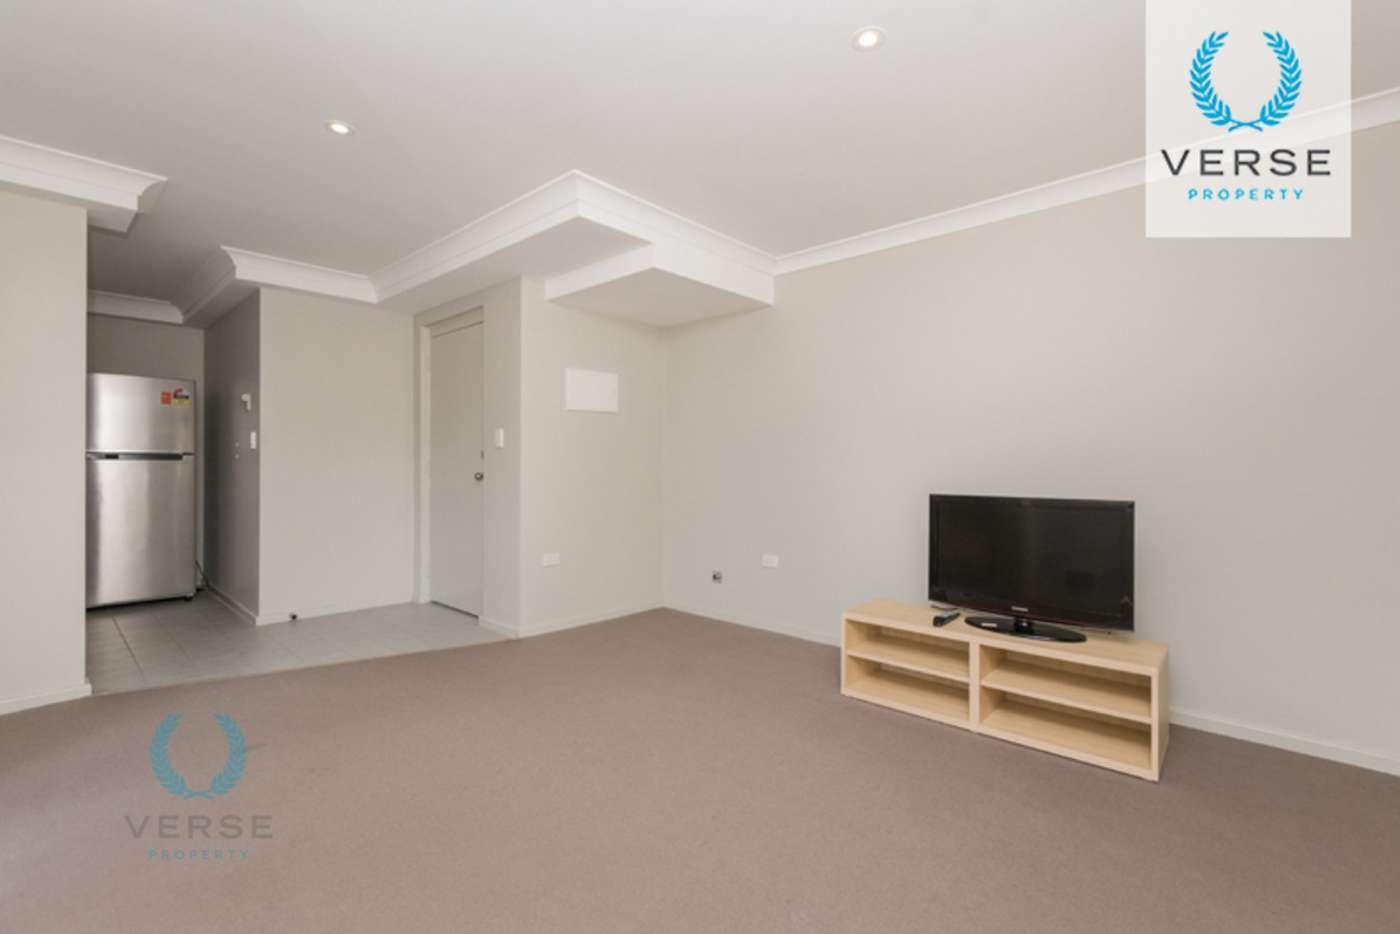 Sixth view of Homely apartment listing, 2/329 Sevenoaks Street, Cannington WA 6107